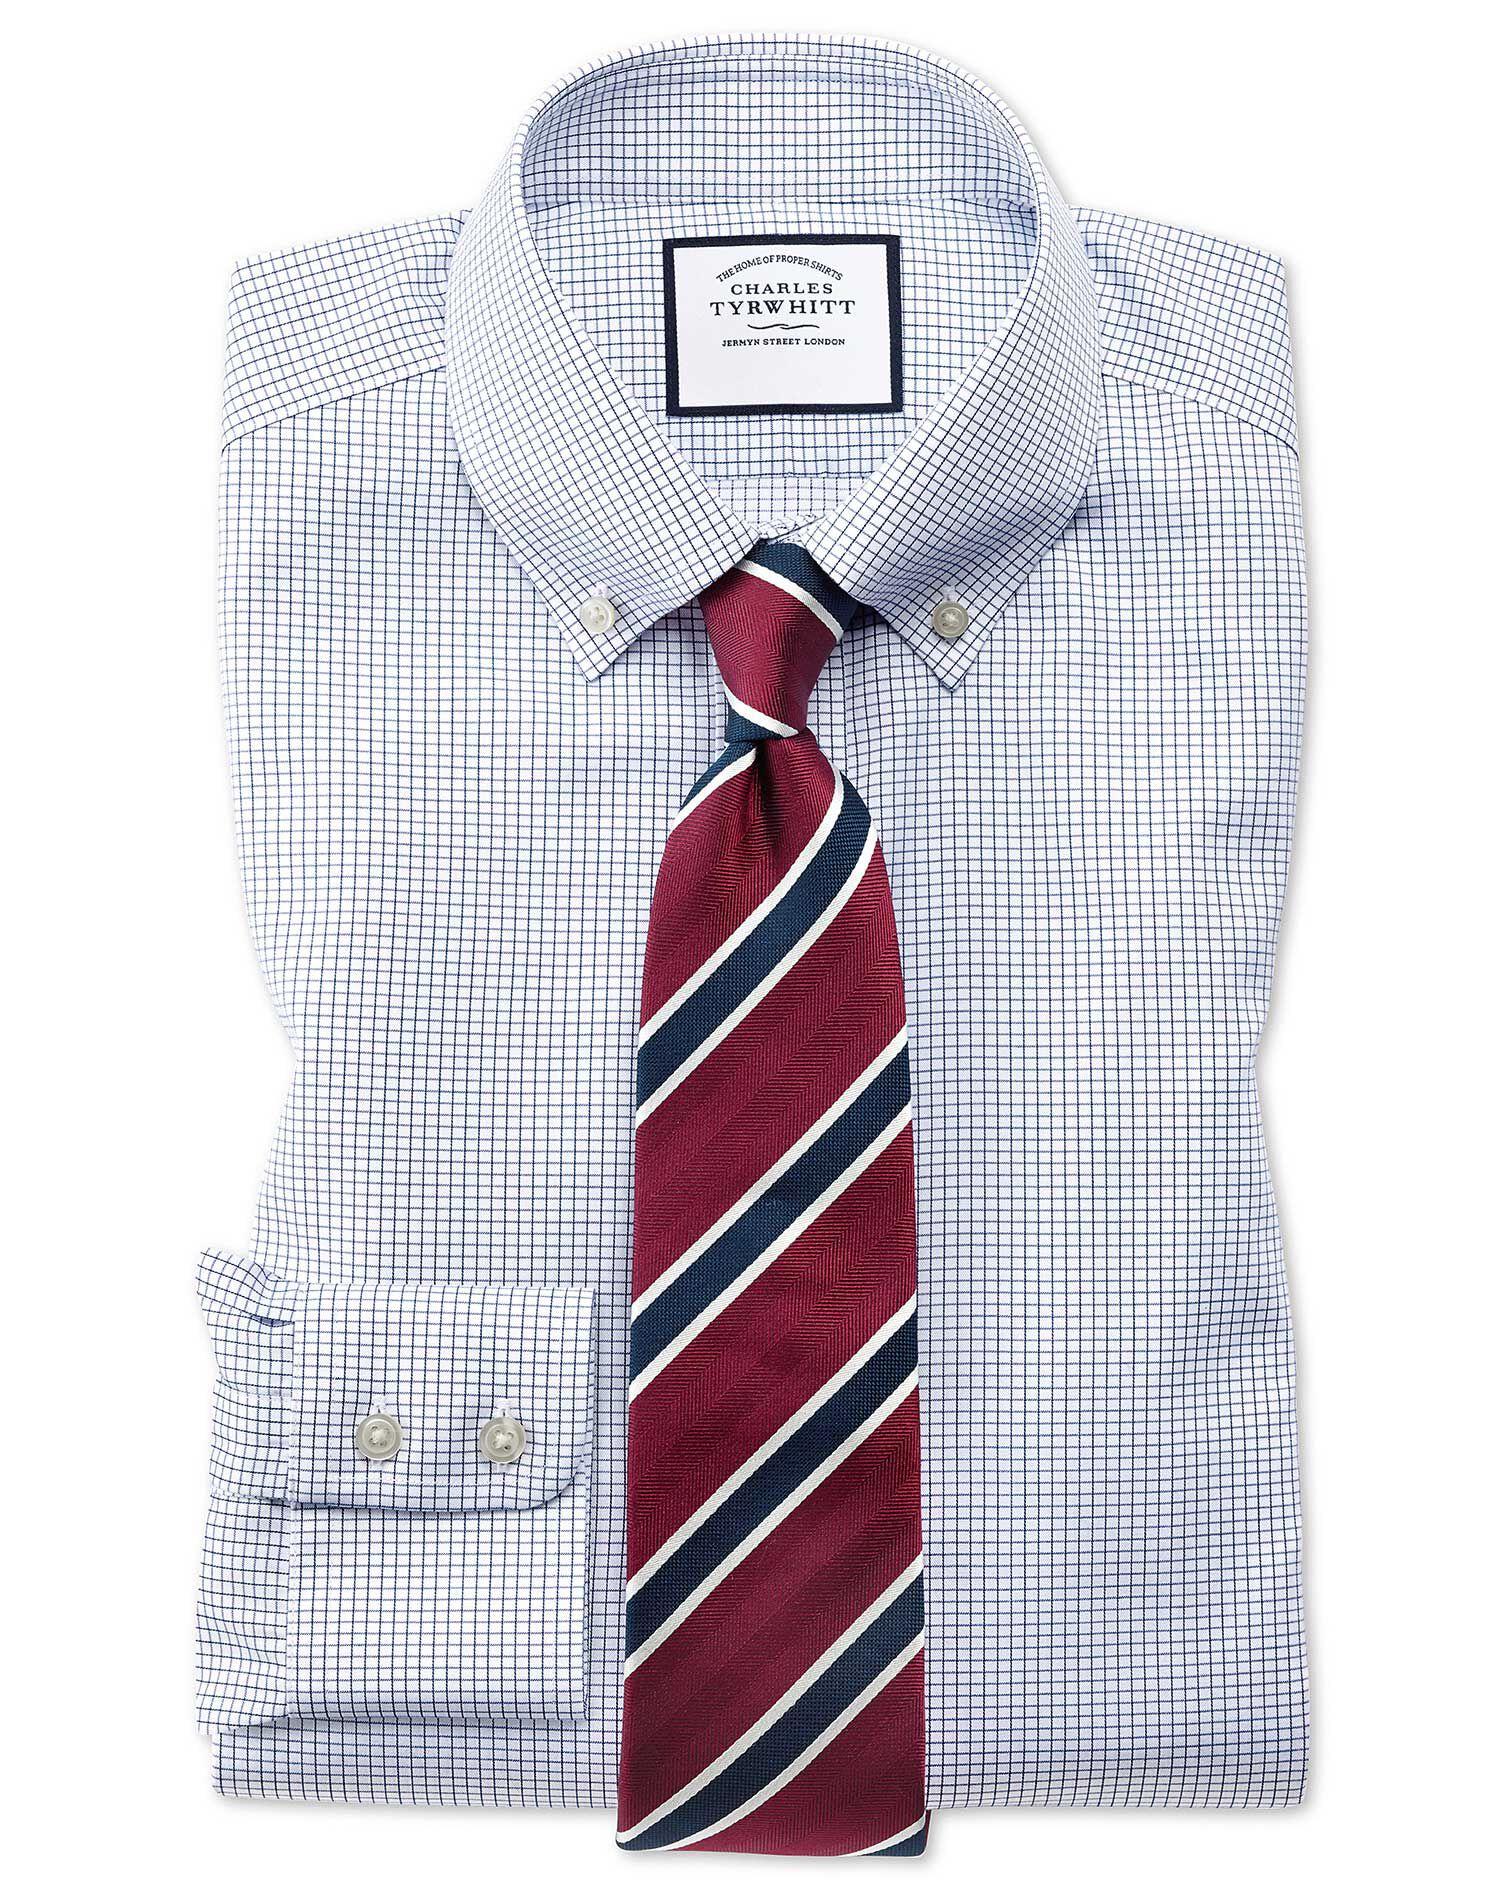 Extra Slim Fit Button-Down Non-Iron Twill Mini Grid Check Navy Blue Cotton Formal Shirt Single Cuff